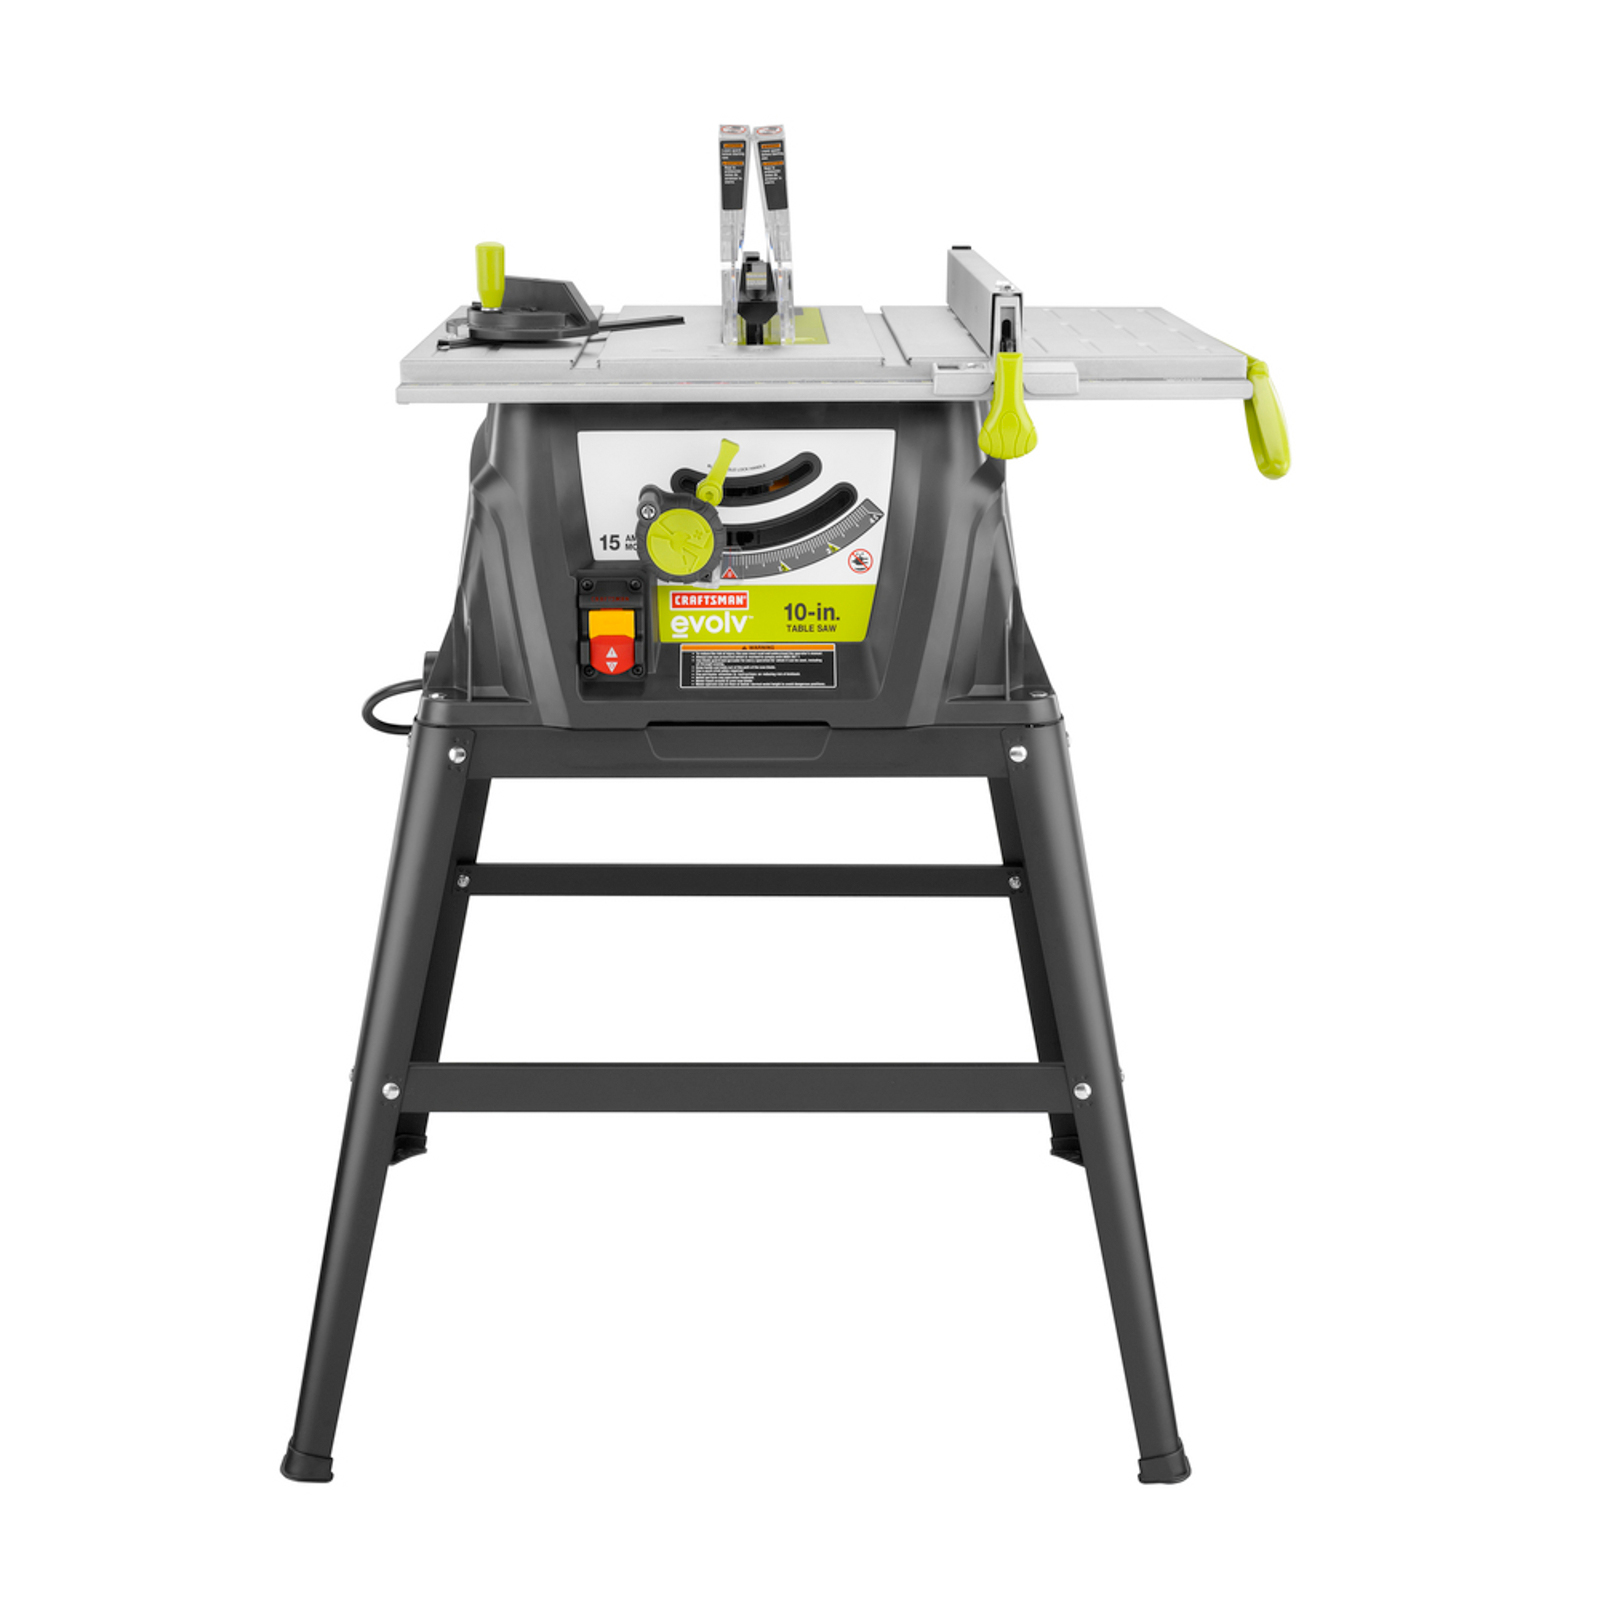 medium resolution of craftsman table saws wiring diagram for craftsman lawn mower evolv 10